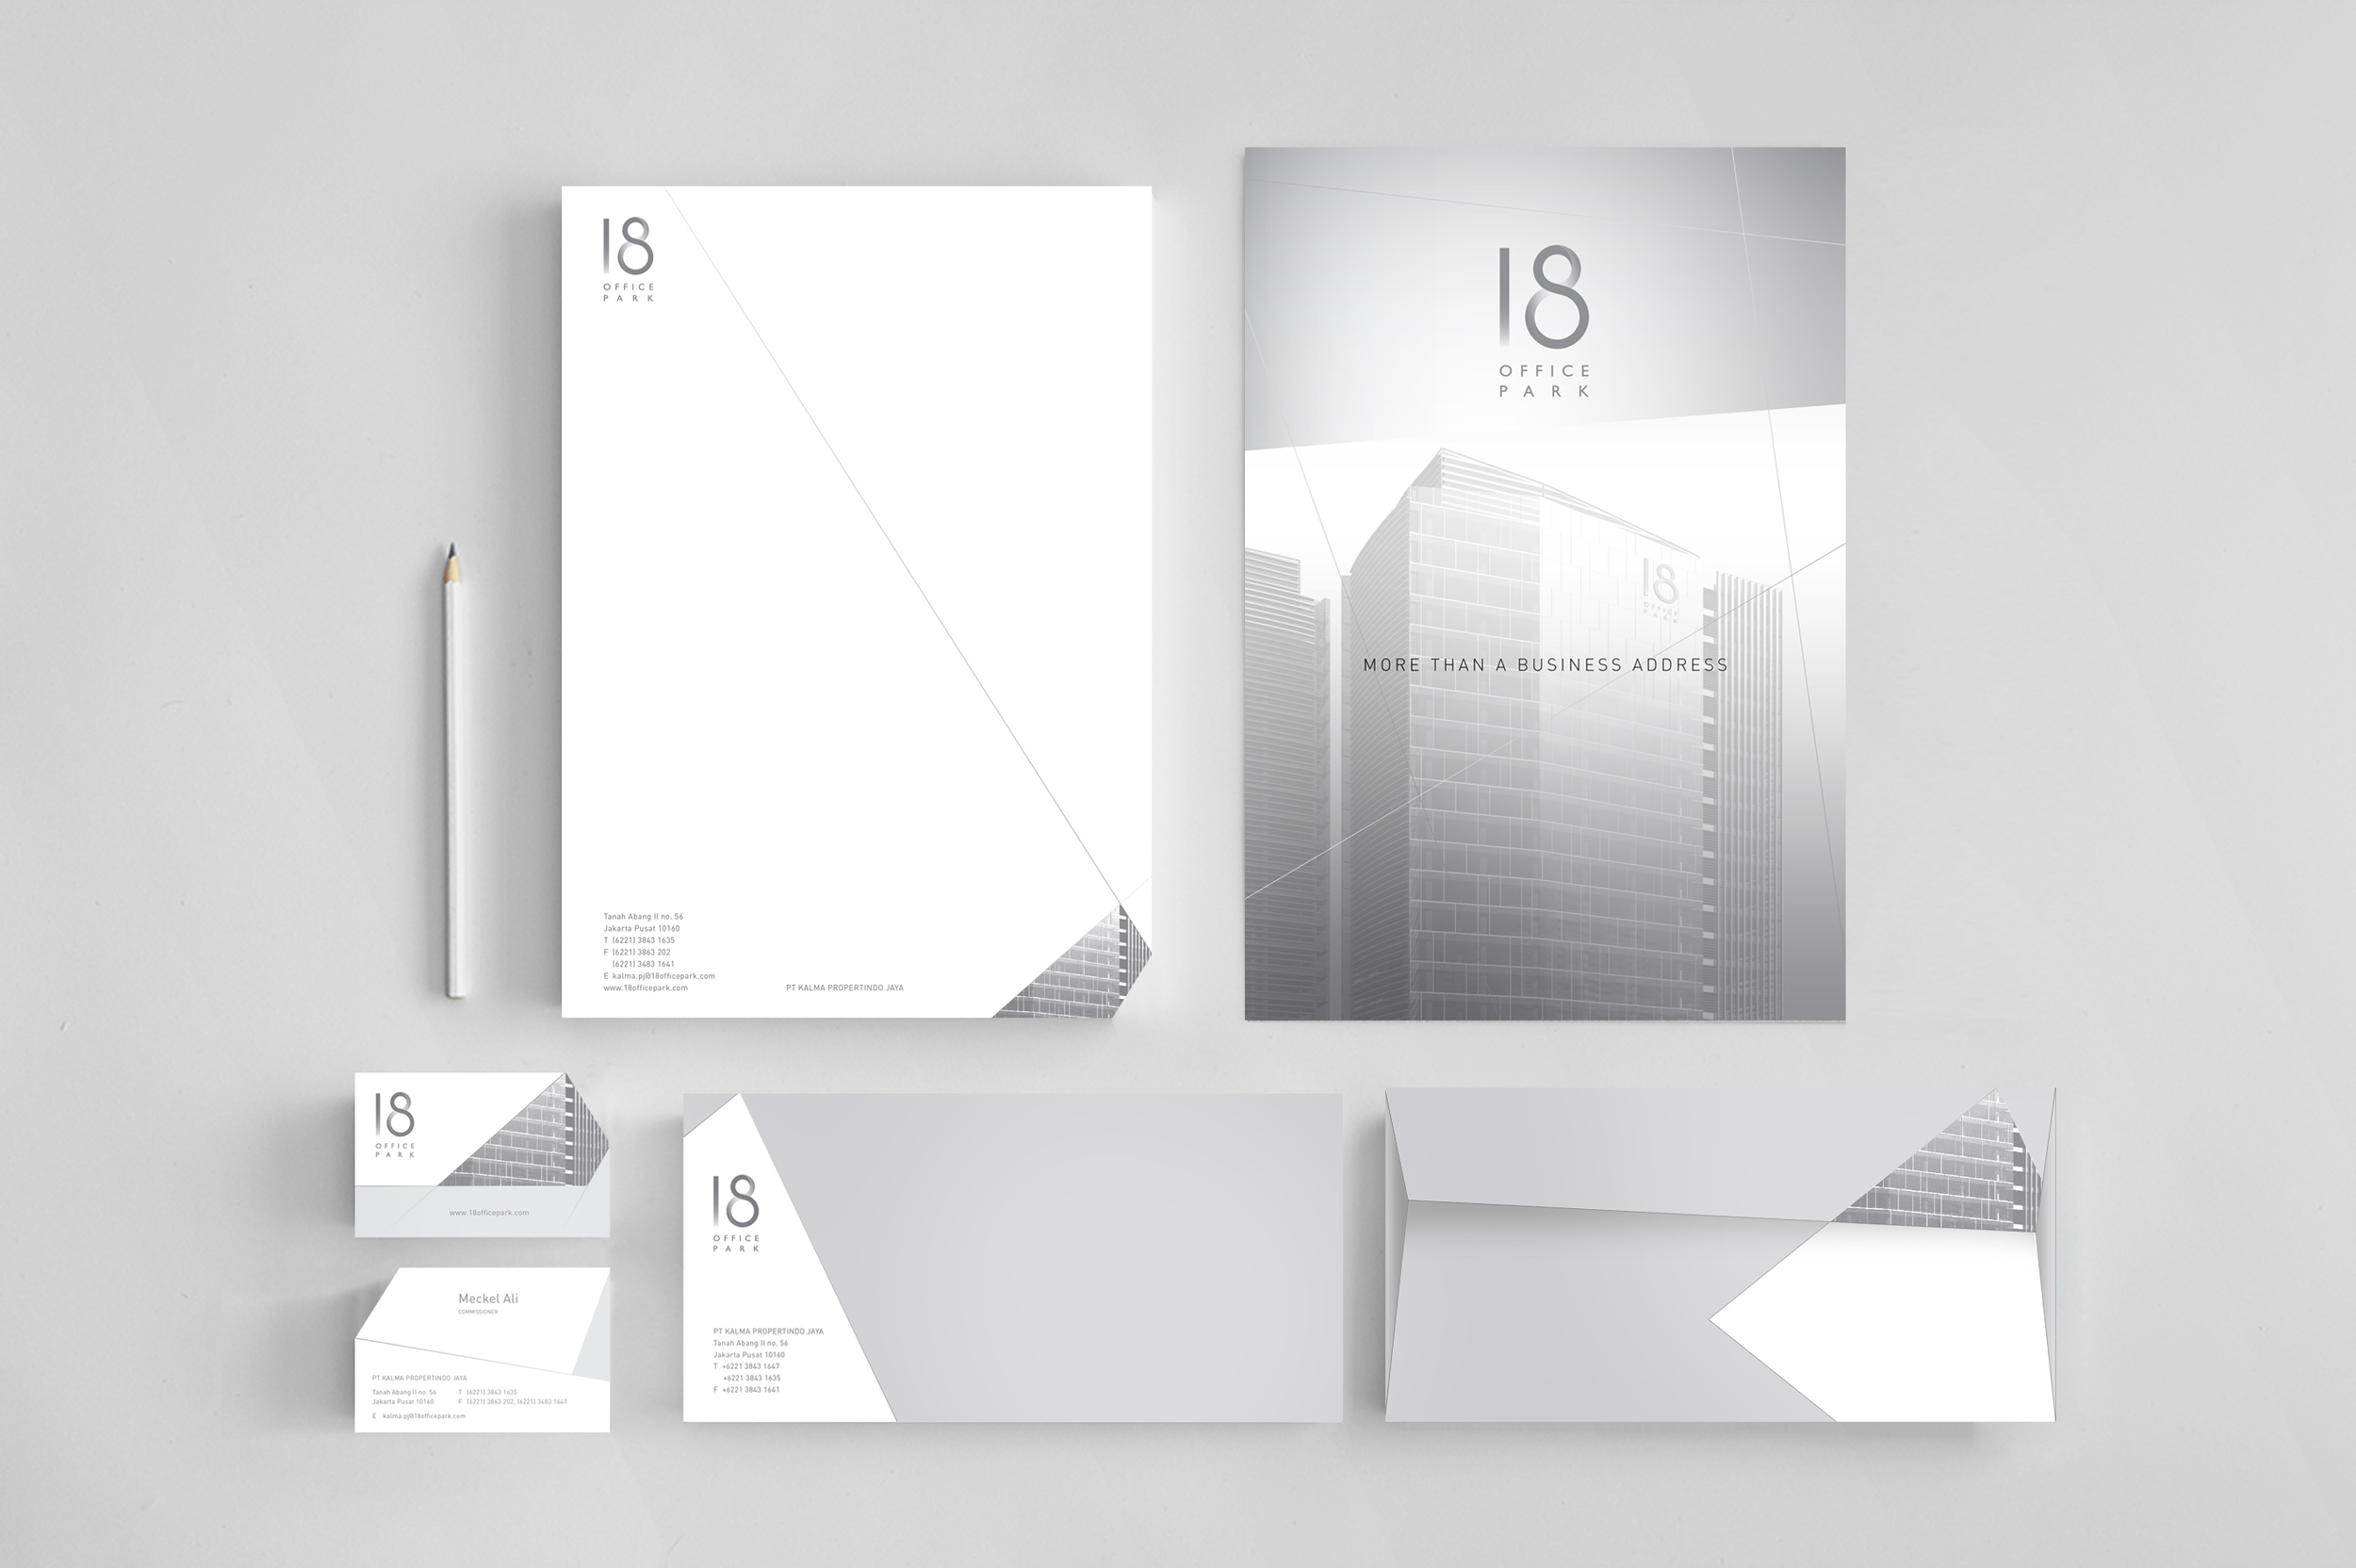 18Office Park_Stationary_v2.jpg